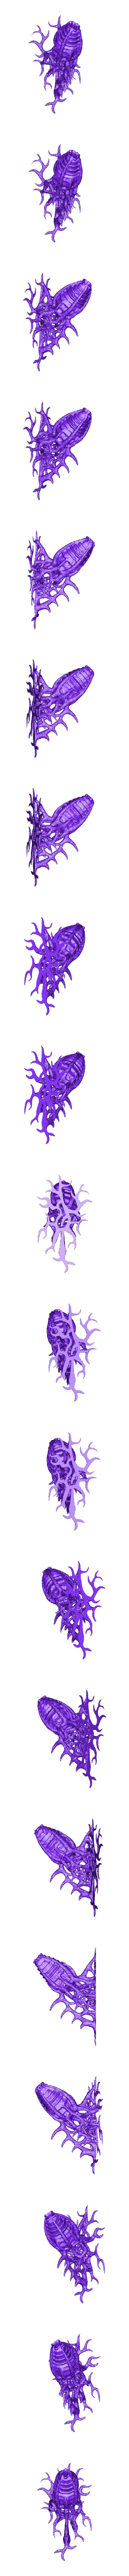 "CannonPlant_detailed.stl Download free STL file Tabletop plant: ""Cannon-Plant"" (Alien Vegetation 09) • 3D printable object, GrimGreeble"